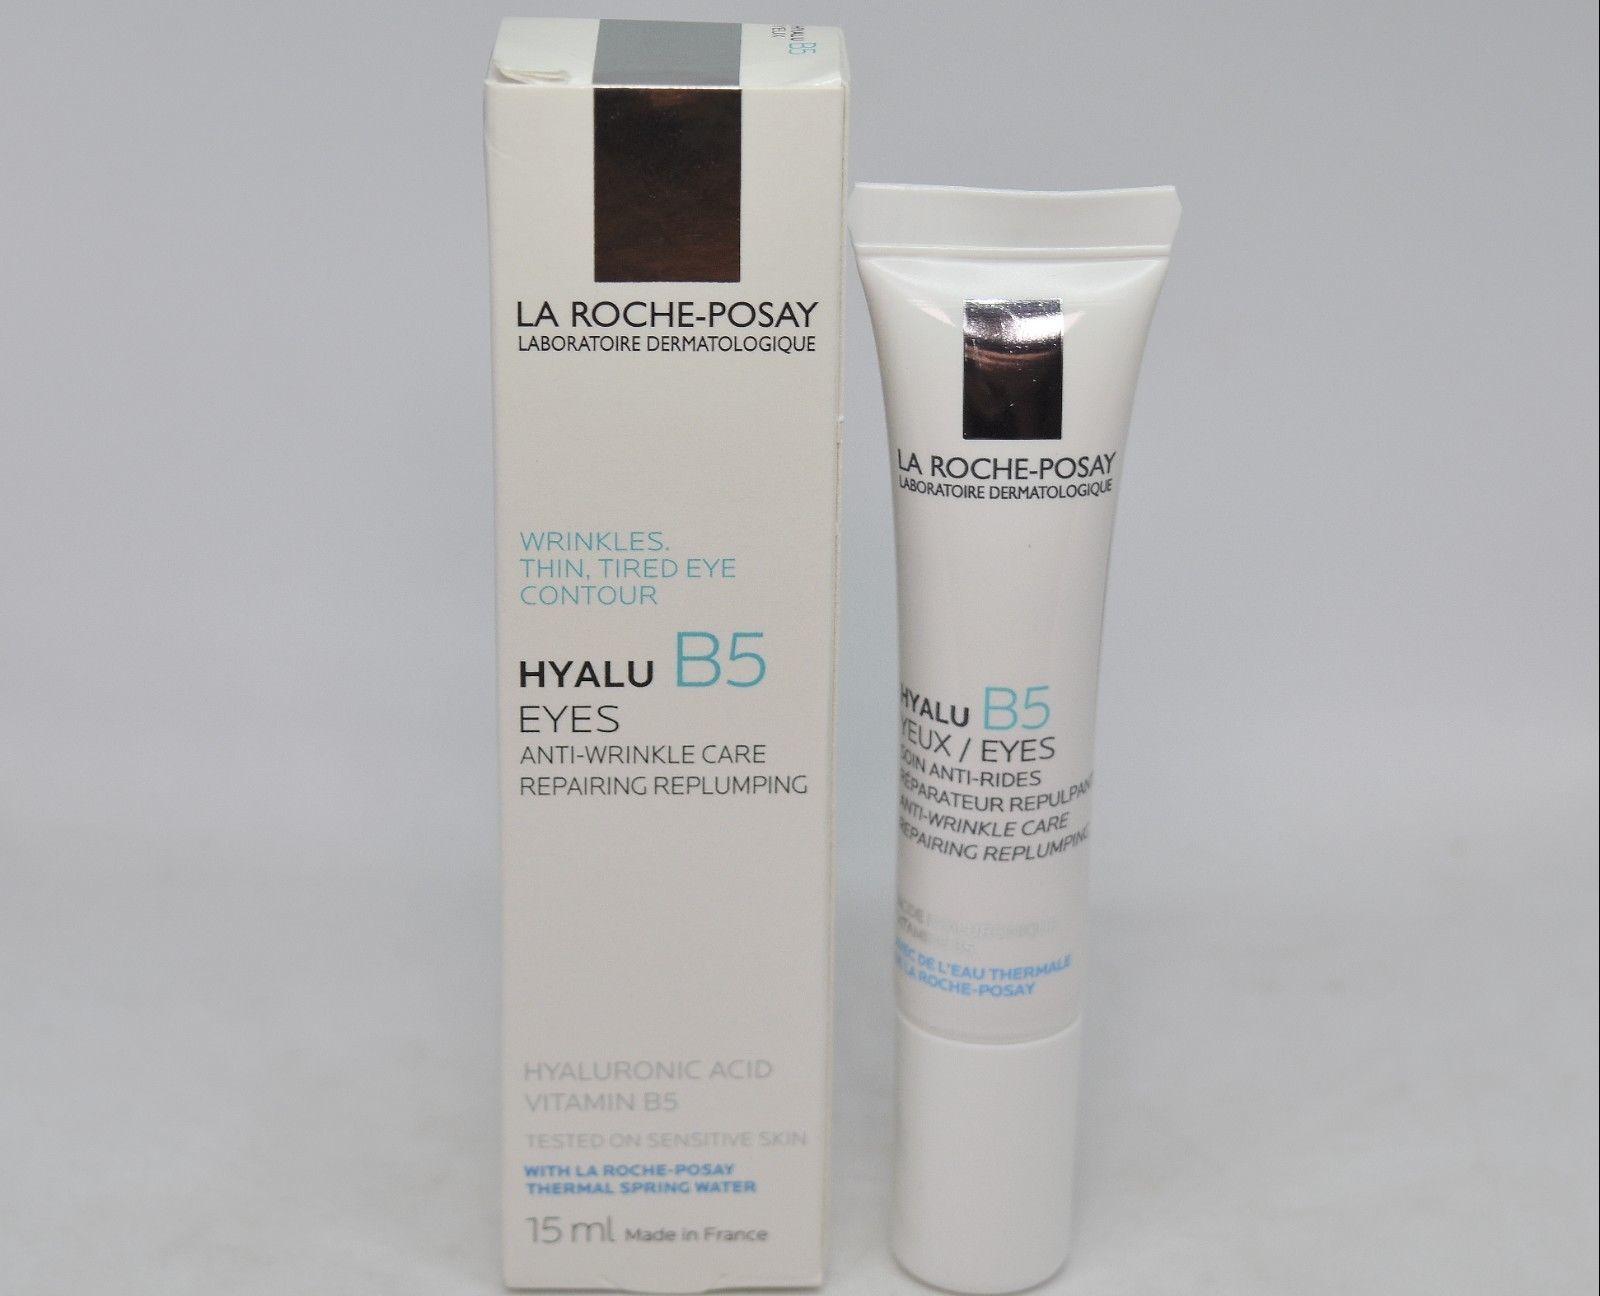 La Roche-Posay Hyalu B5 Anti-Wrinkle Eye Cream, 15ml [BB 03/22] [New&Sealed] - $14.49